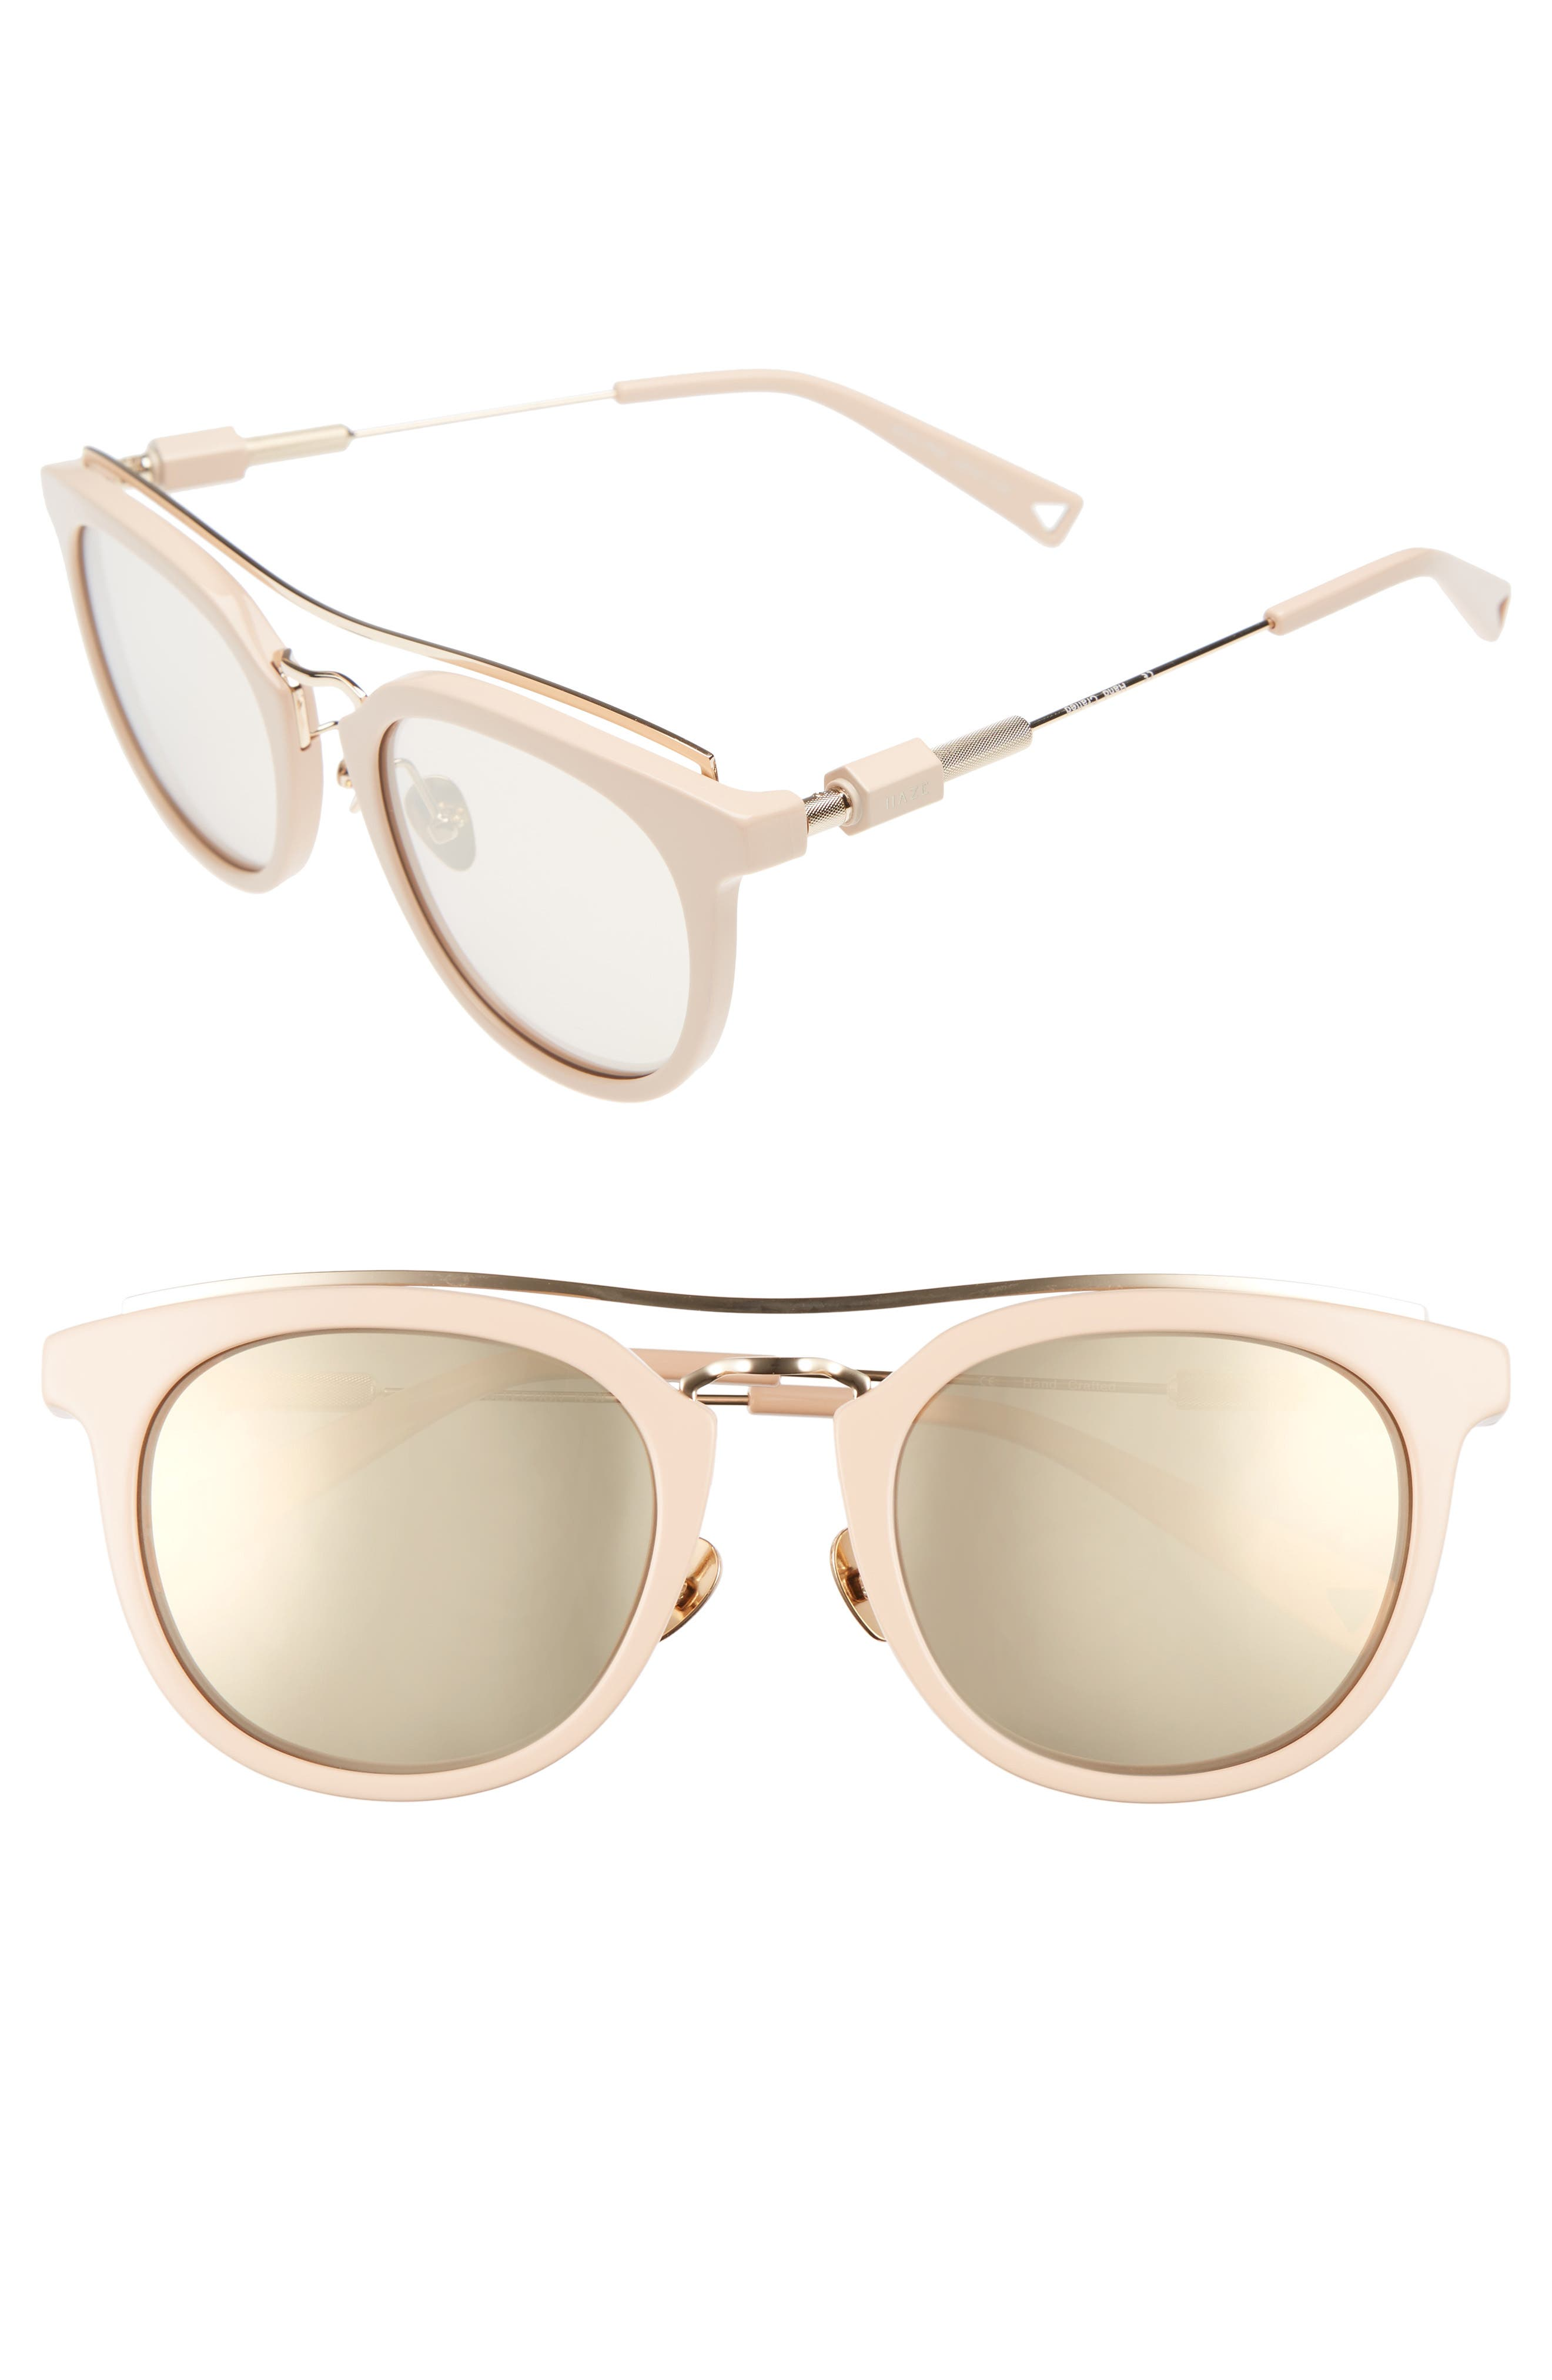 Zeal 52mm Aviator Sunglasses,                         Main,                         color,